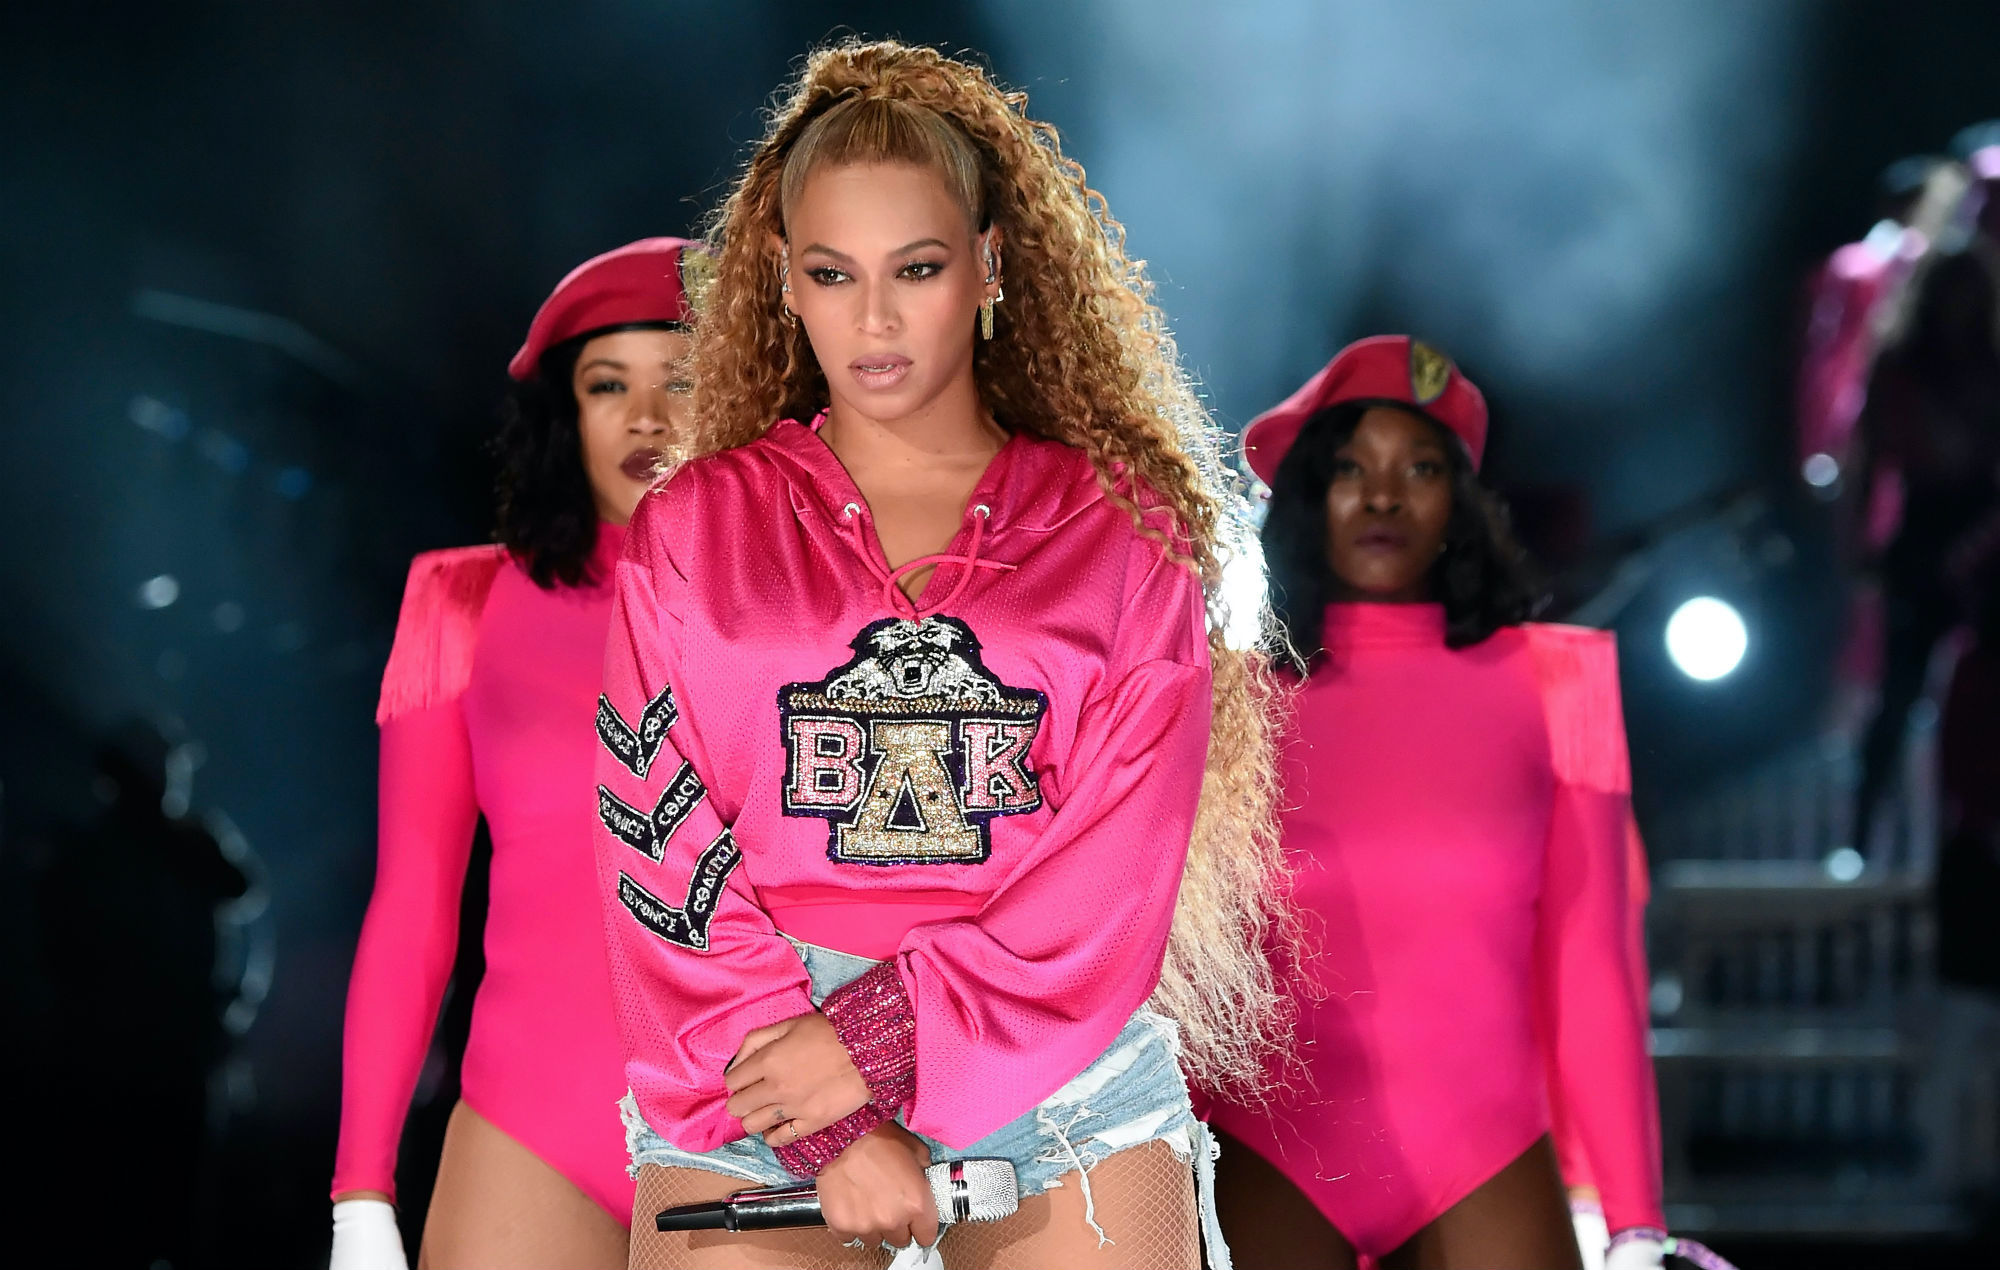 Beyoncé's Ivy Park x Adidas range teases Icy Park winter collection